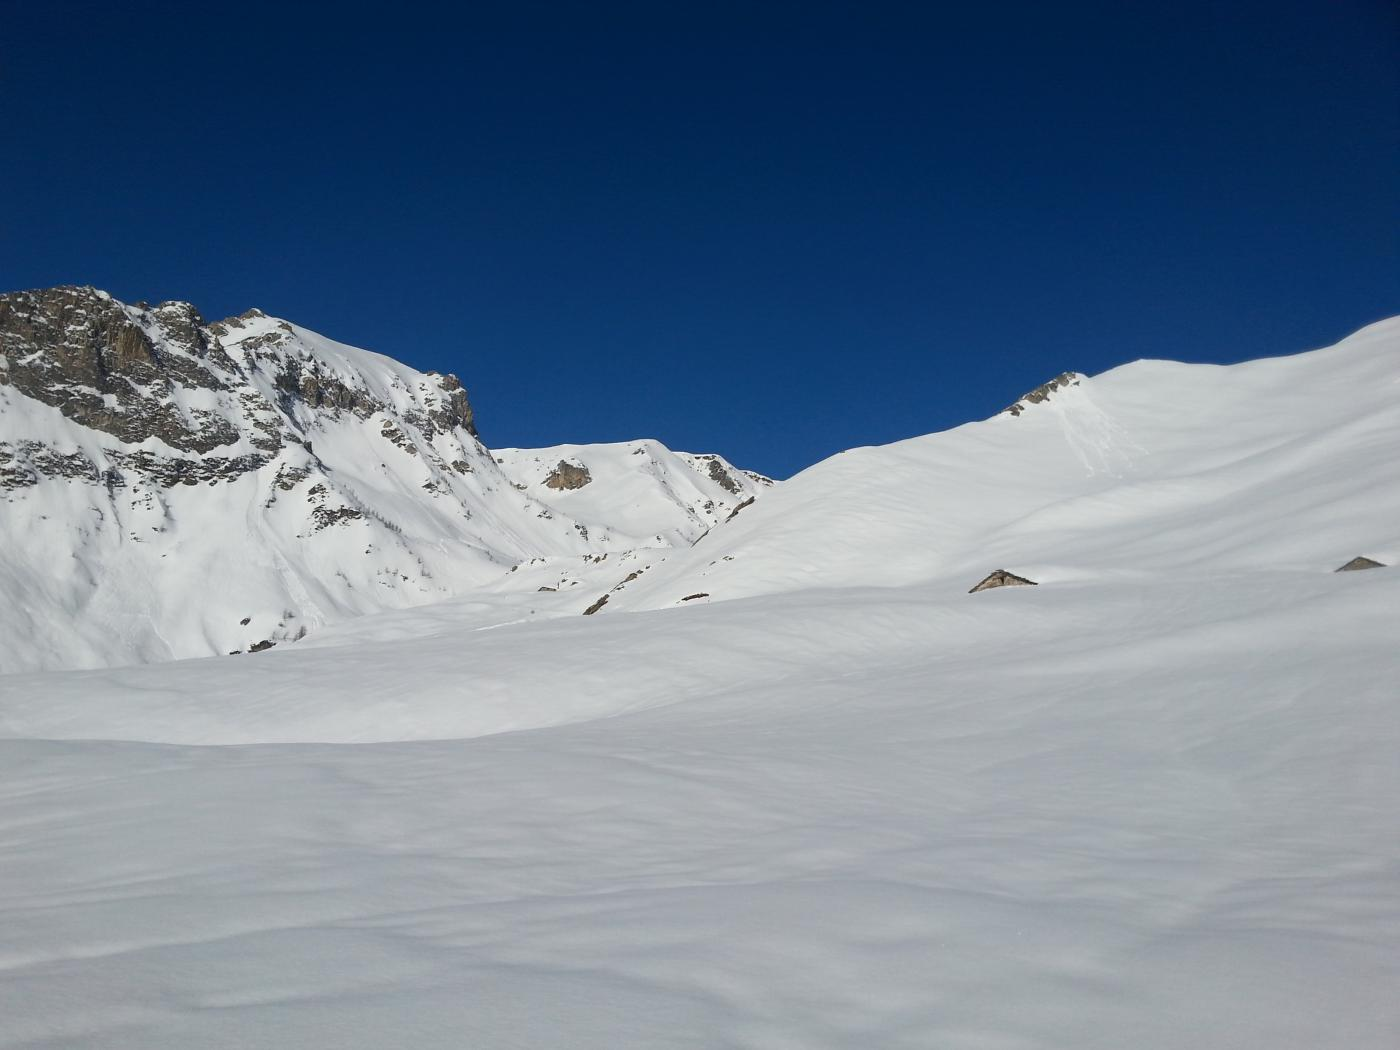 Grange quasi sommerse dalla neve